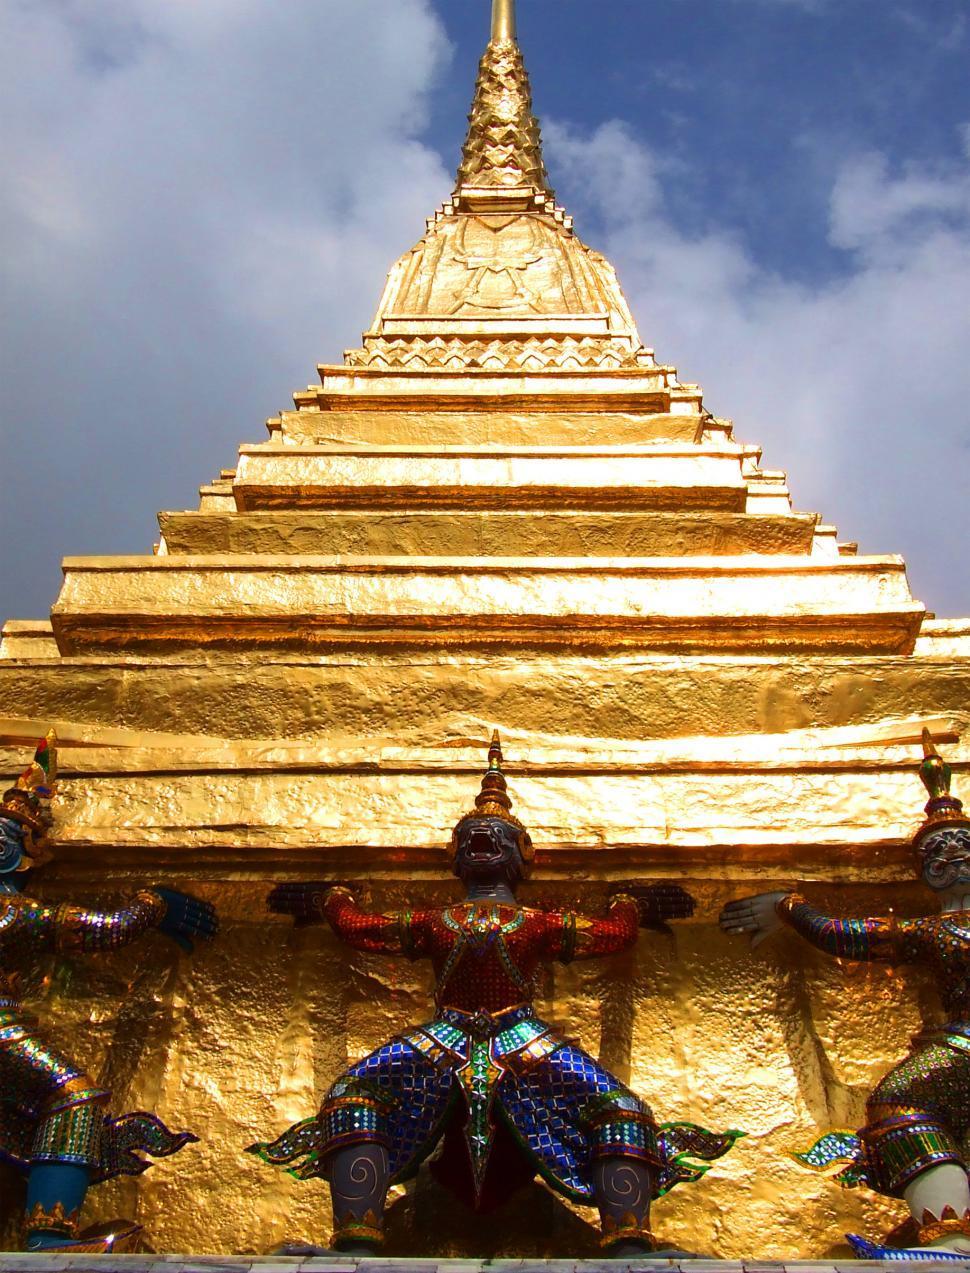 Download Free Stock HD Photo of Guardians lifting the Pagoda - Wat Phra Kaew - Bangkok - Thailan Online